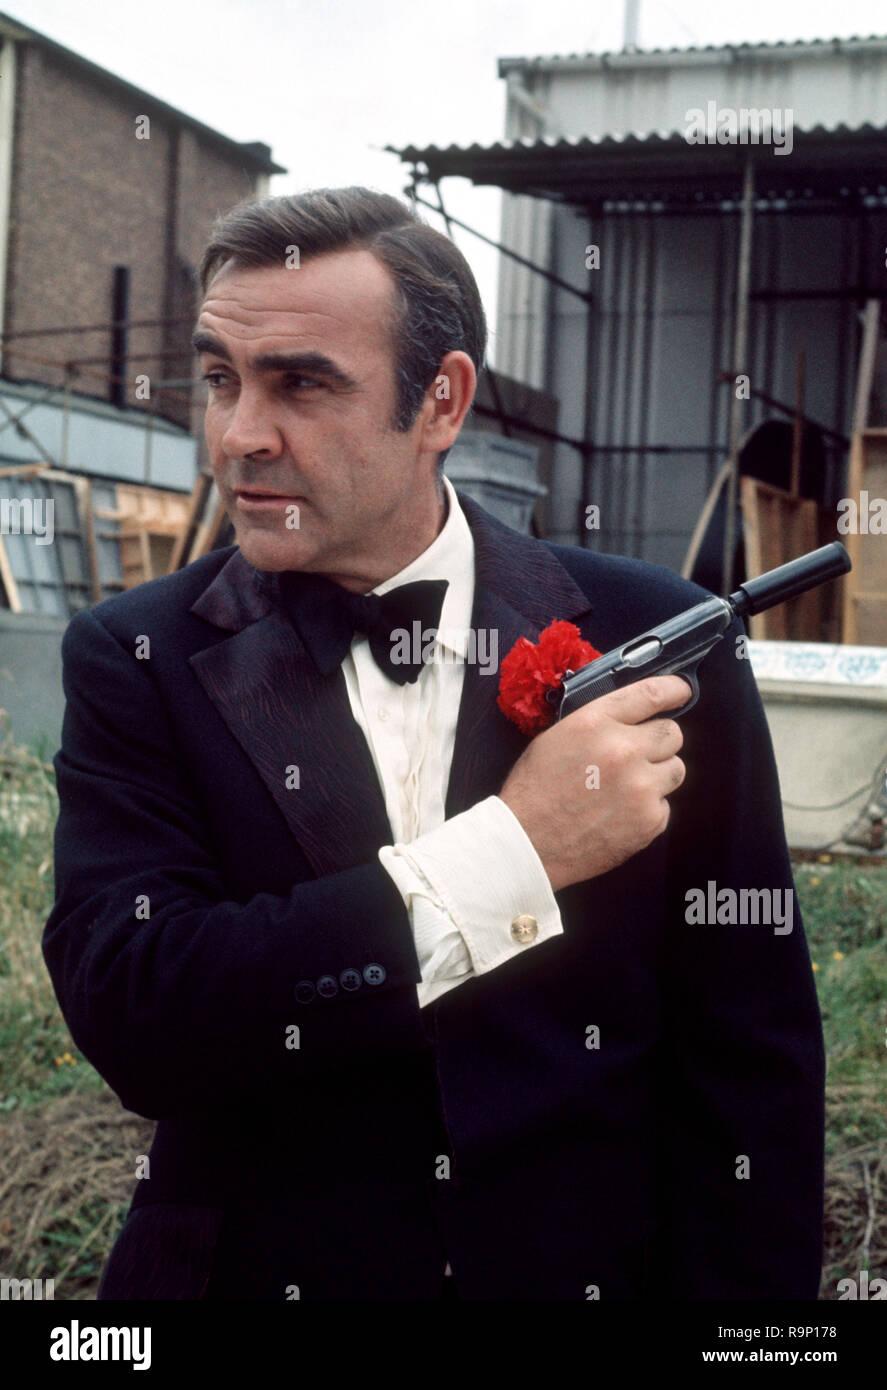 Archives - Sean Connery dans le film Juste cause, dArne